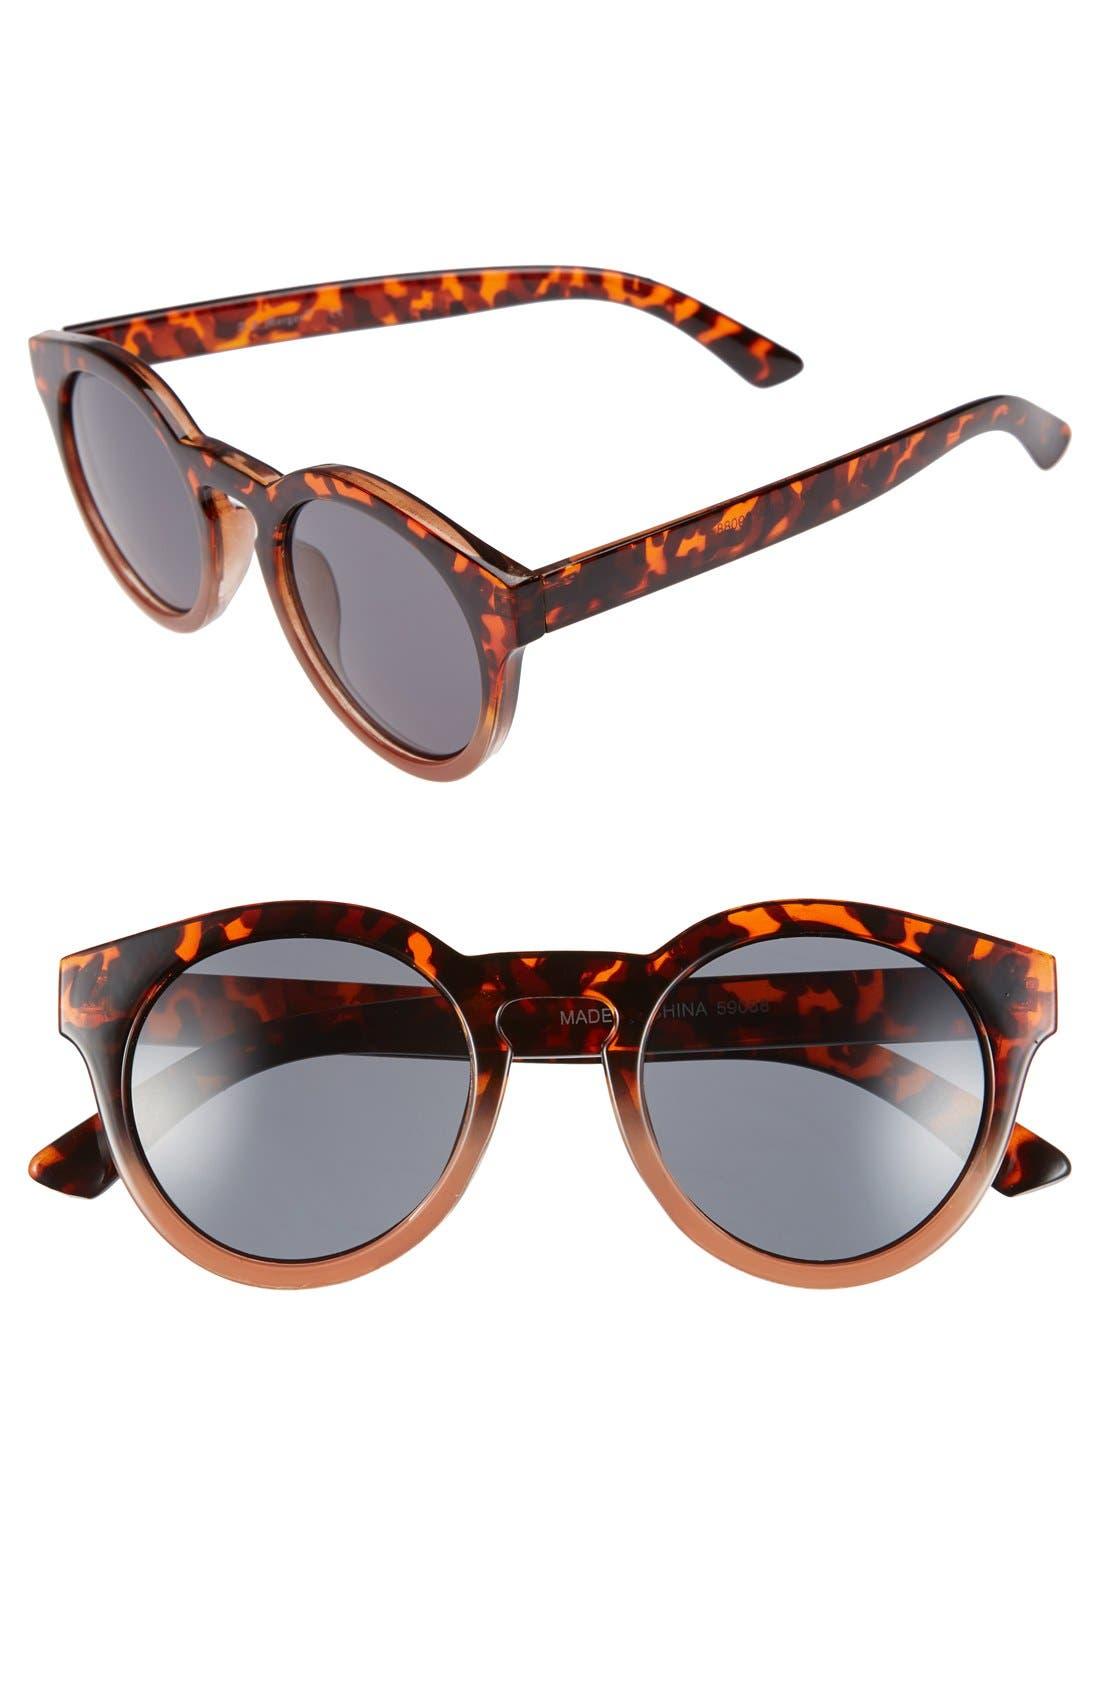 Main Image - A.J. Morgan 'Hmmm' 49mm Cat Eye Sunglasses